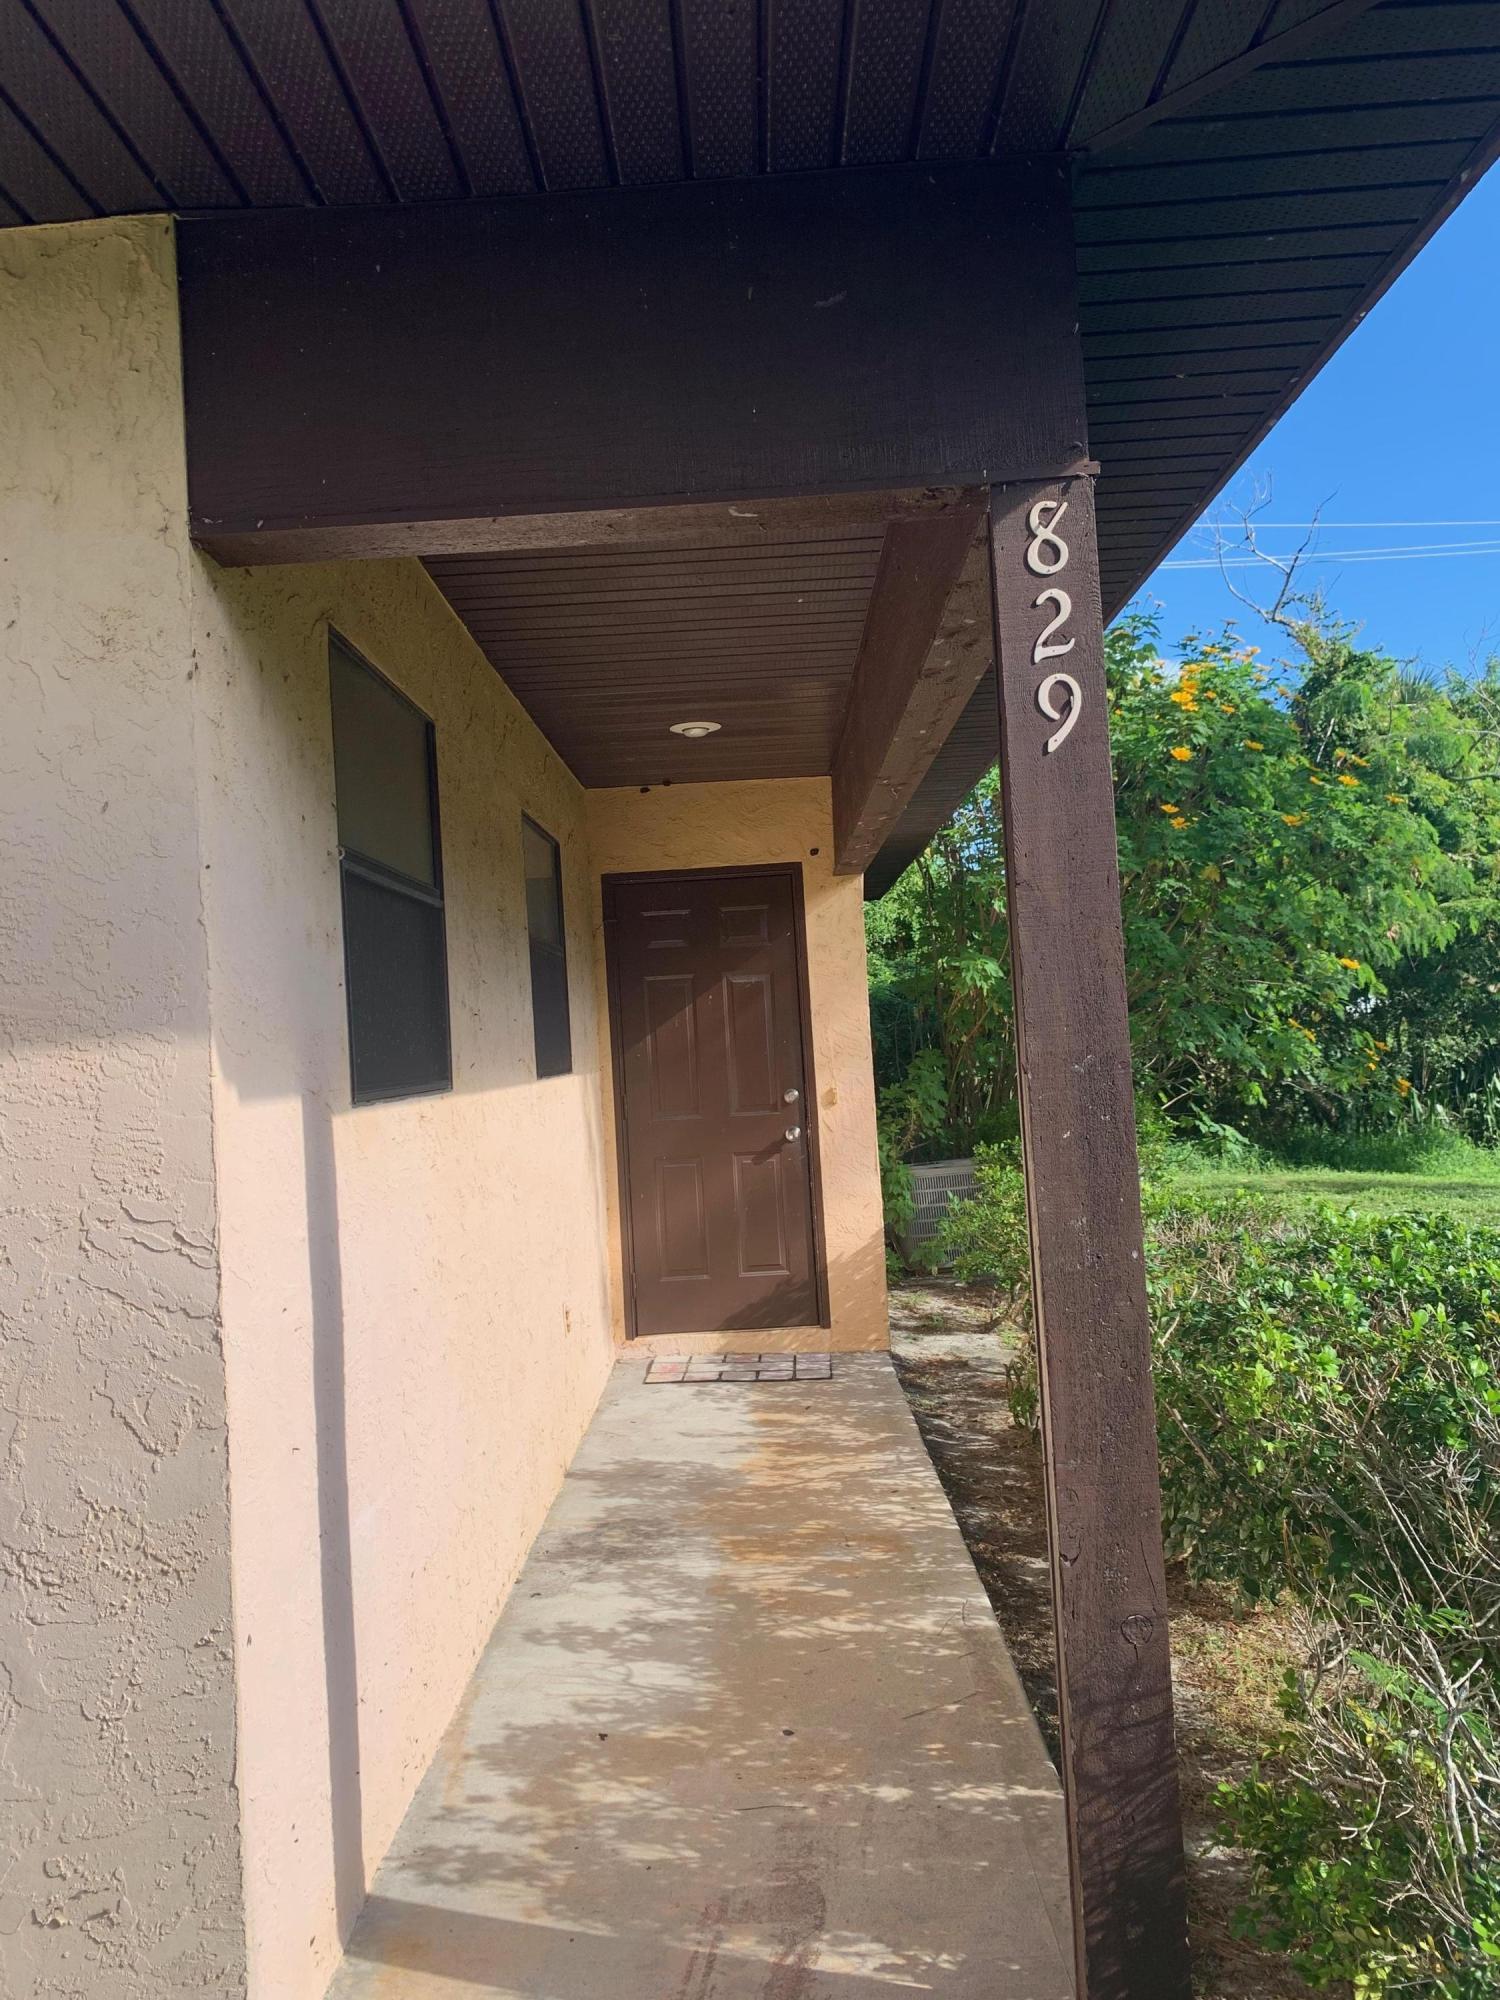 829 Nw 11th Terrace, Stuart, FL 34994